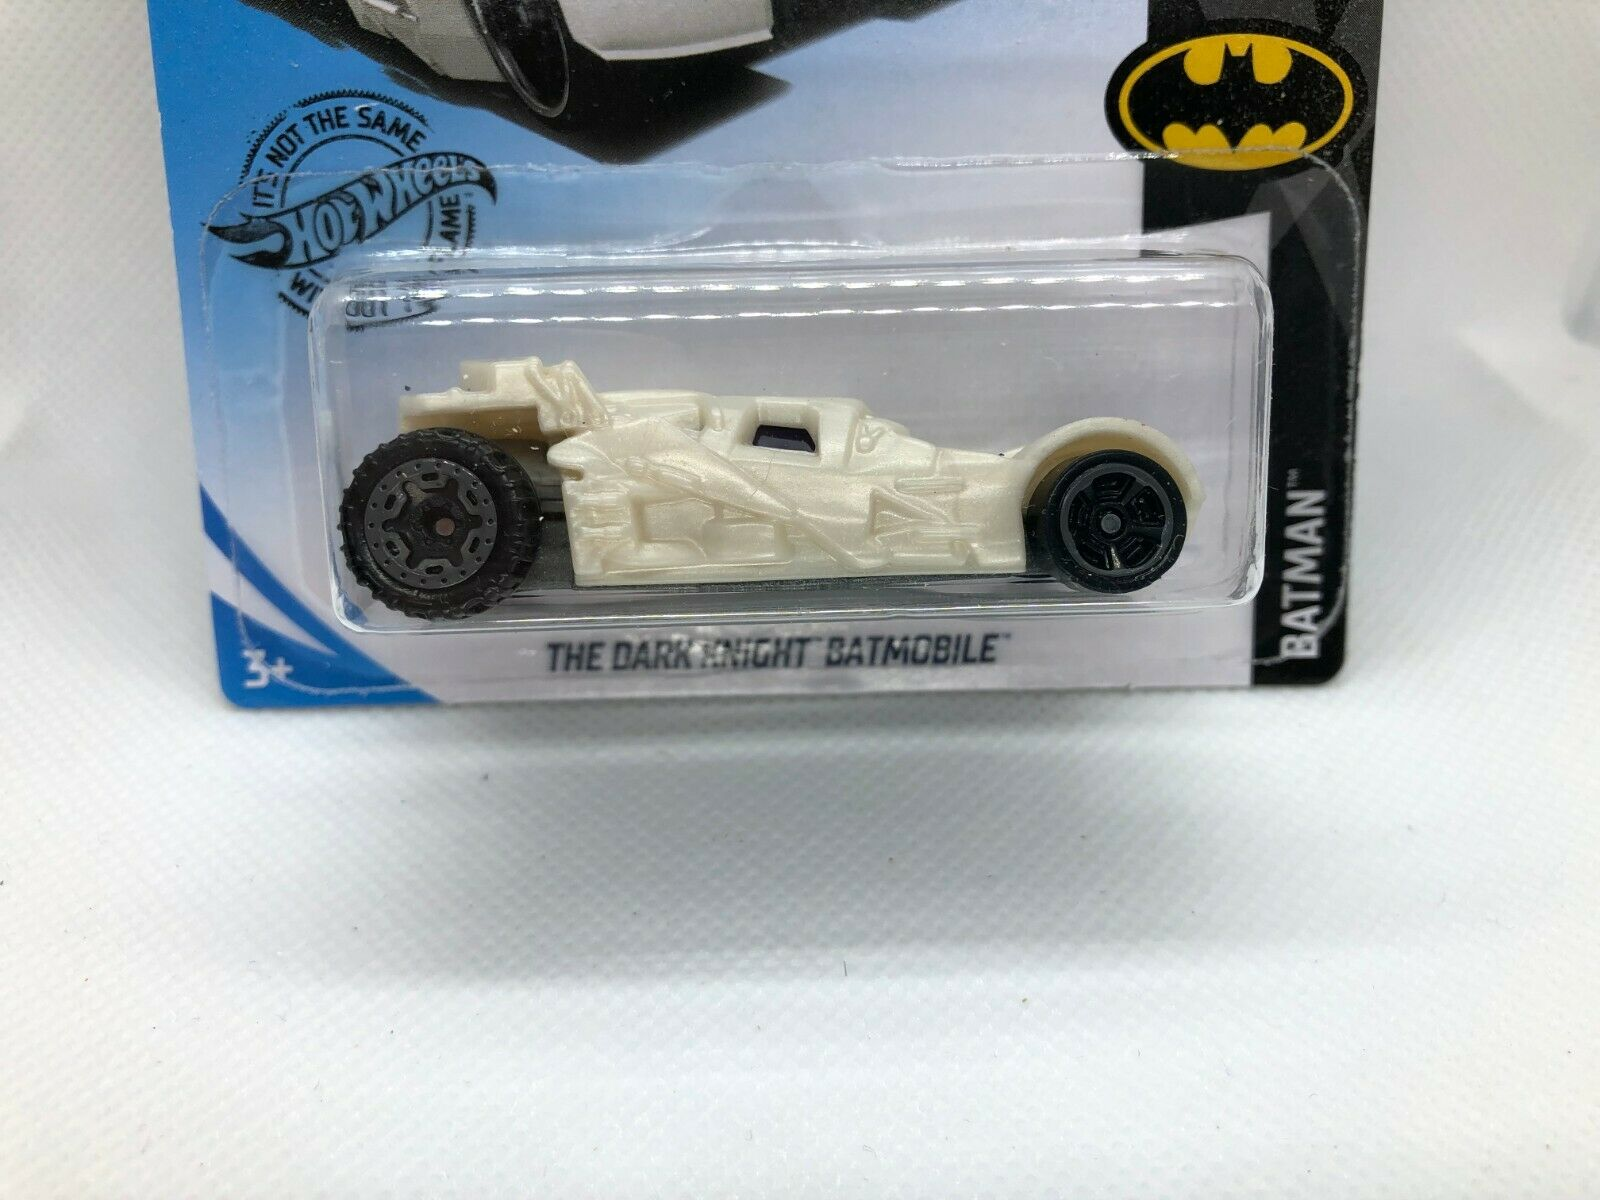 The Dark Knight Batmobile